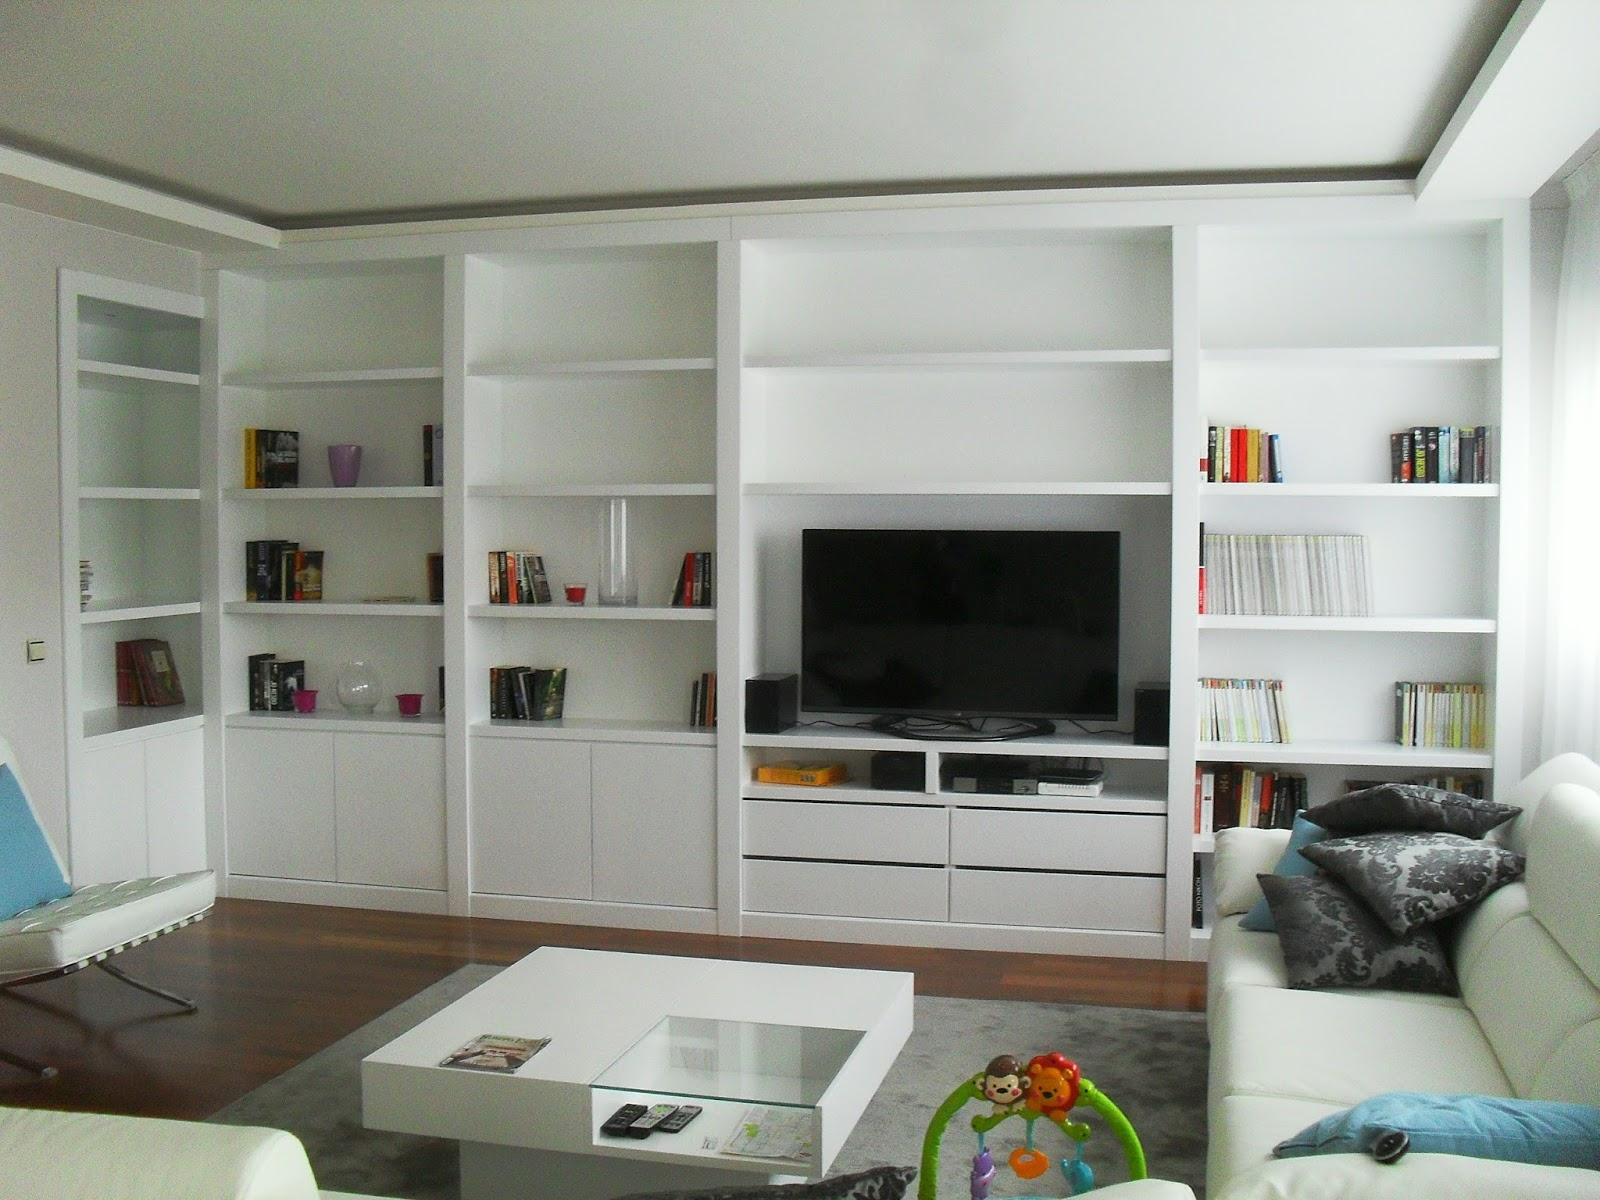 Libreria a medida madrid mueble a medida 617075183 elcarpinterodemadrid librerias a - Librerias a medida en madrid ...